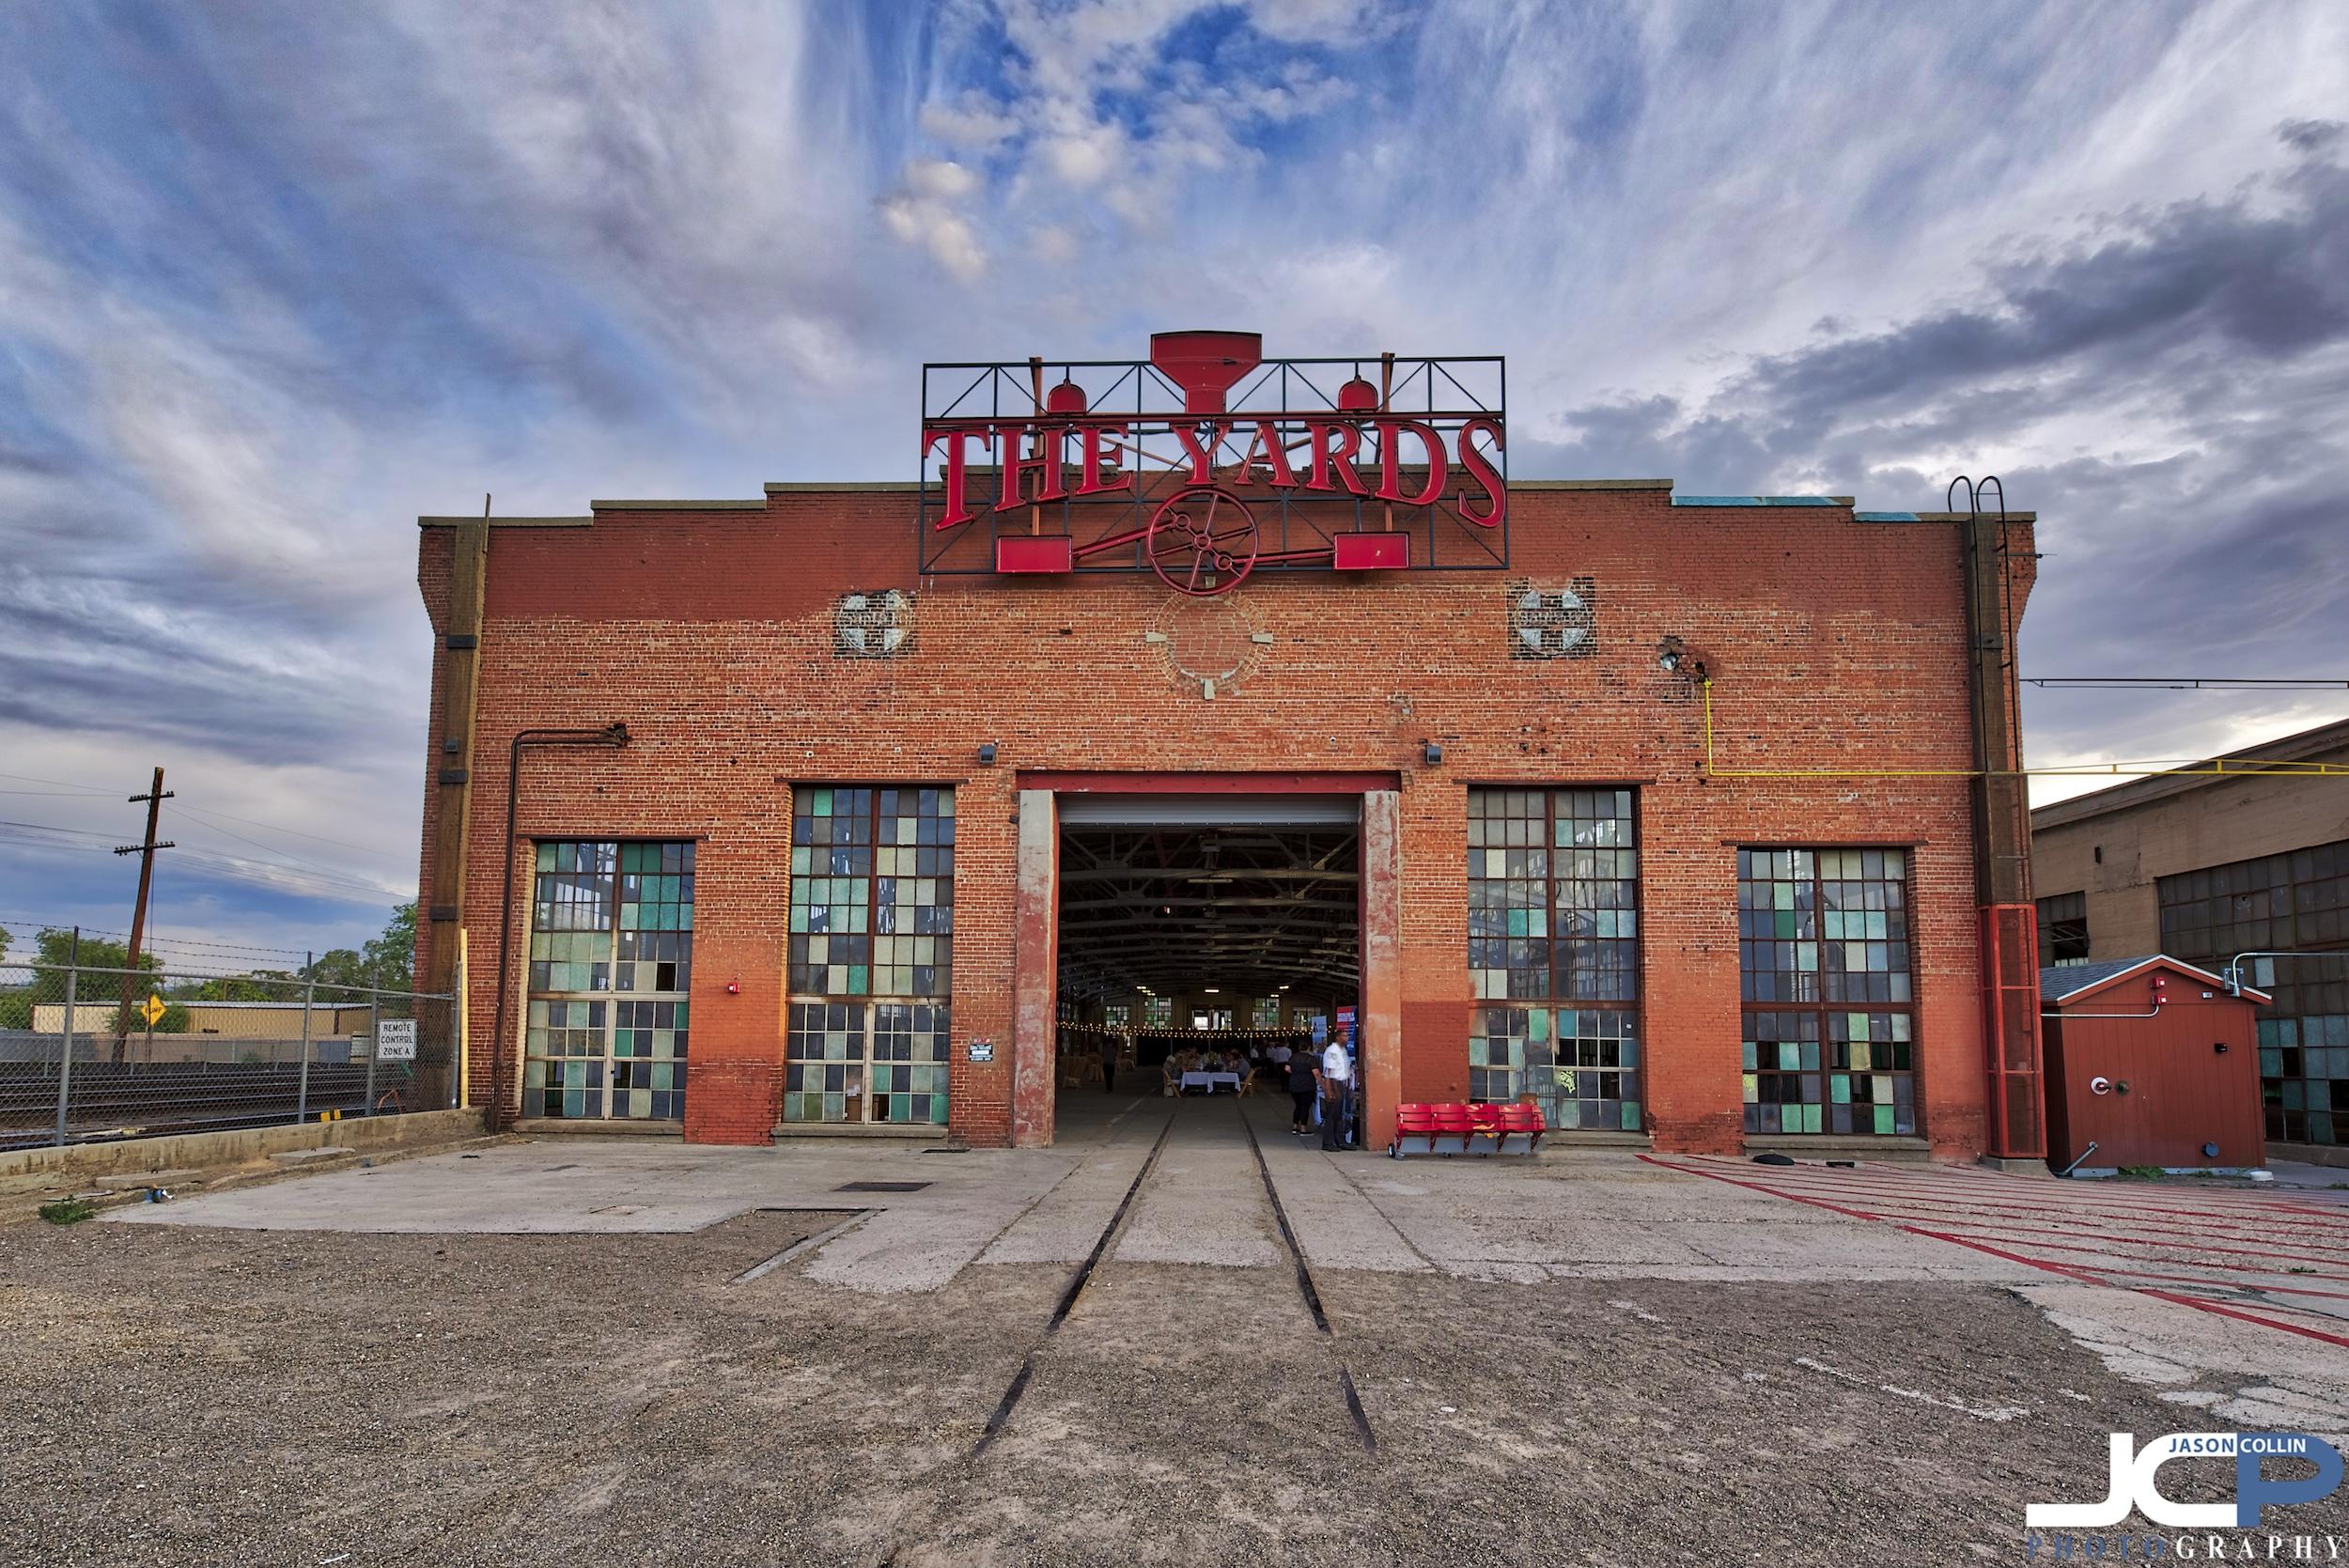 railyards-6-14-2018-abq-93459.jpg